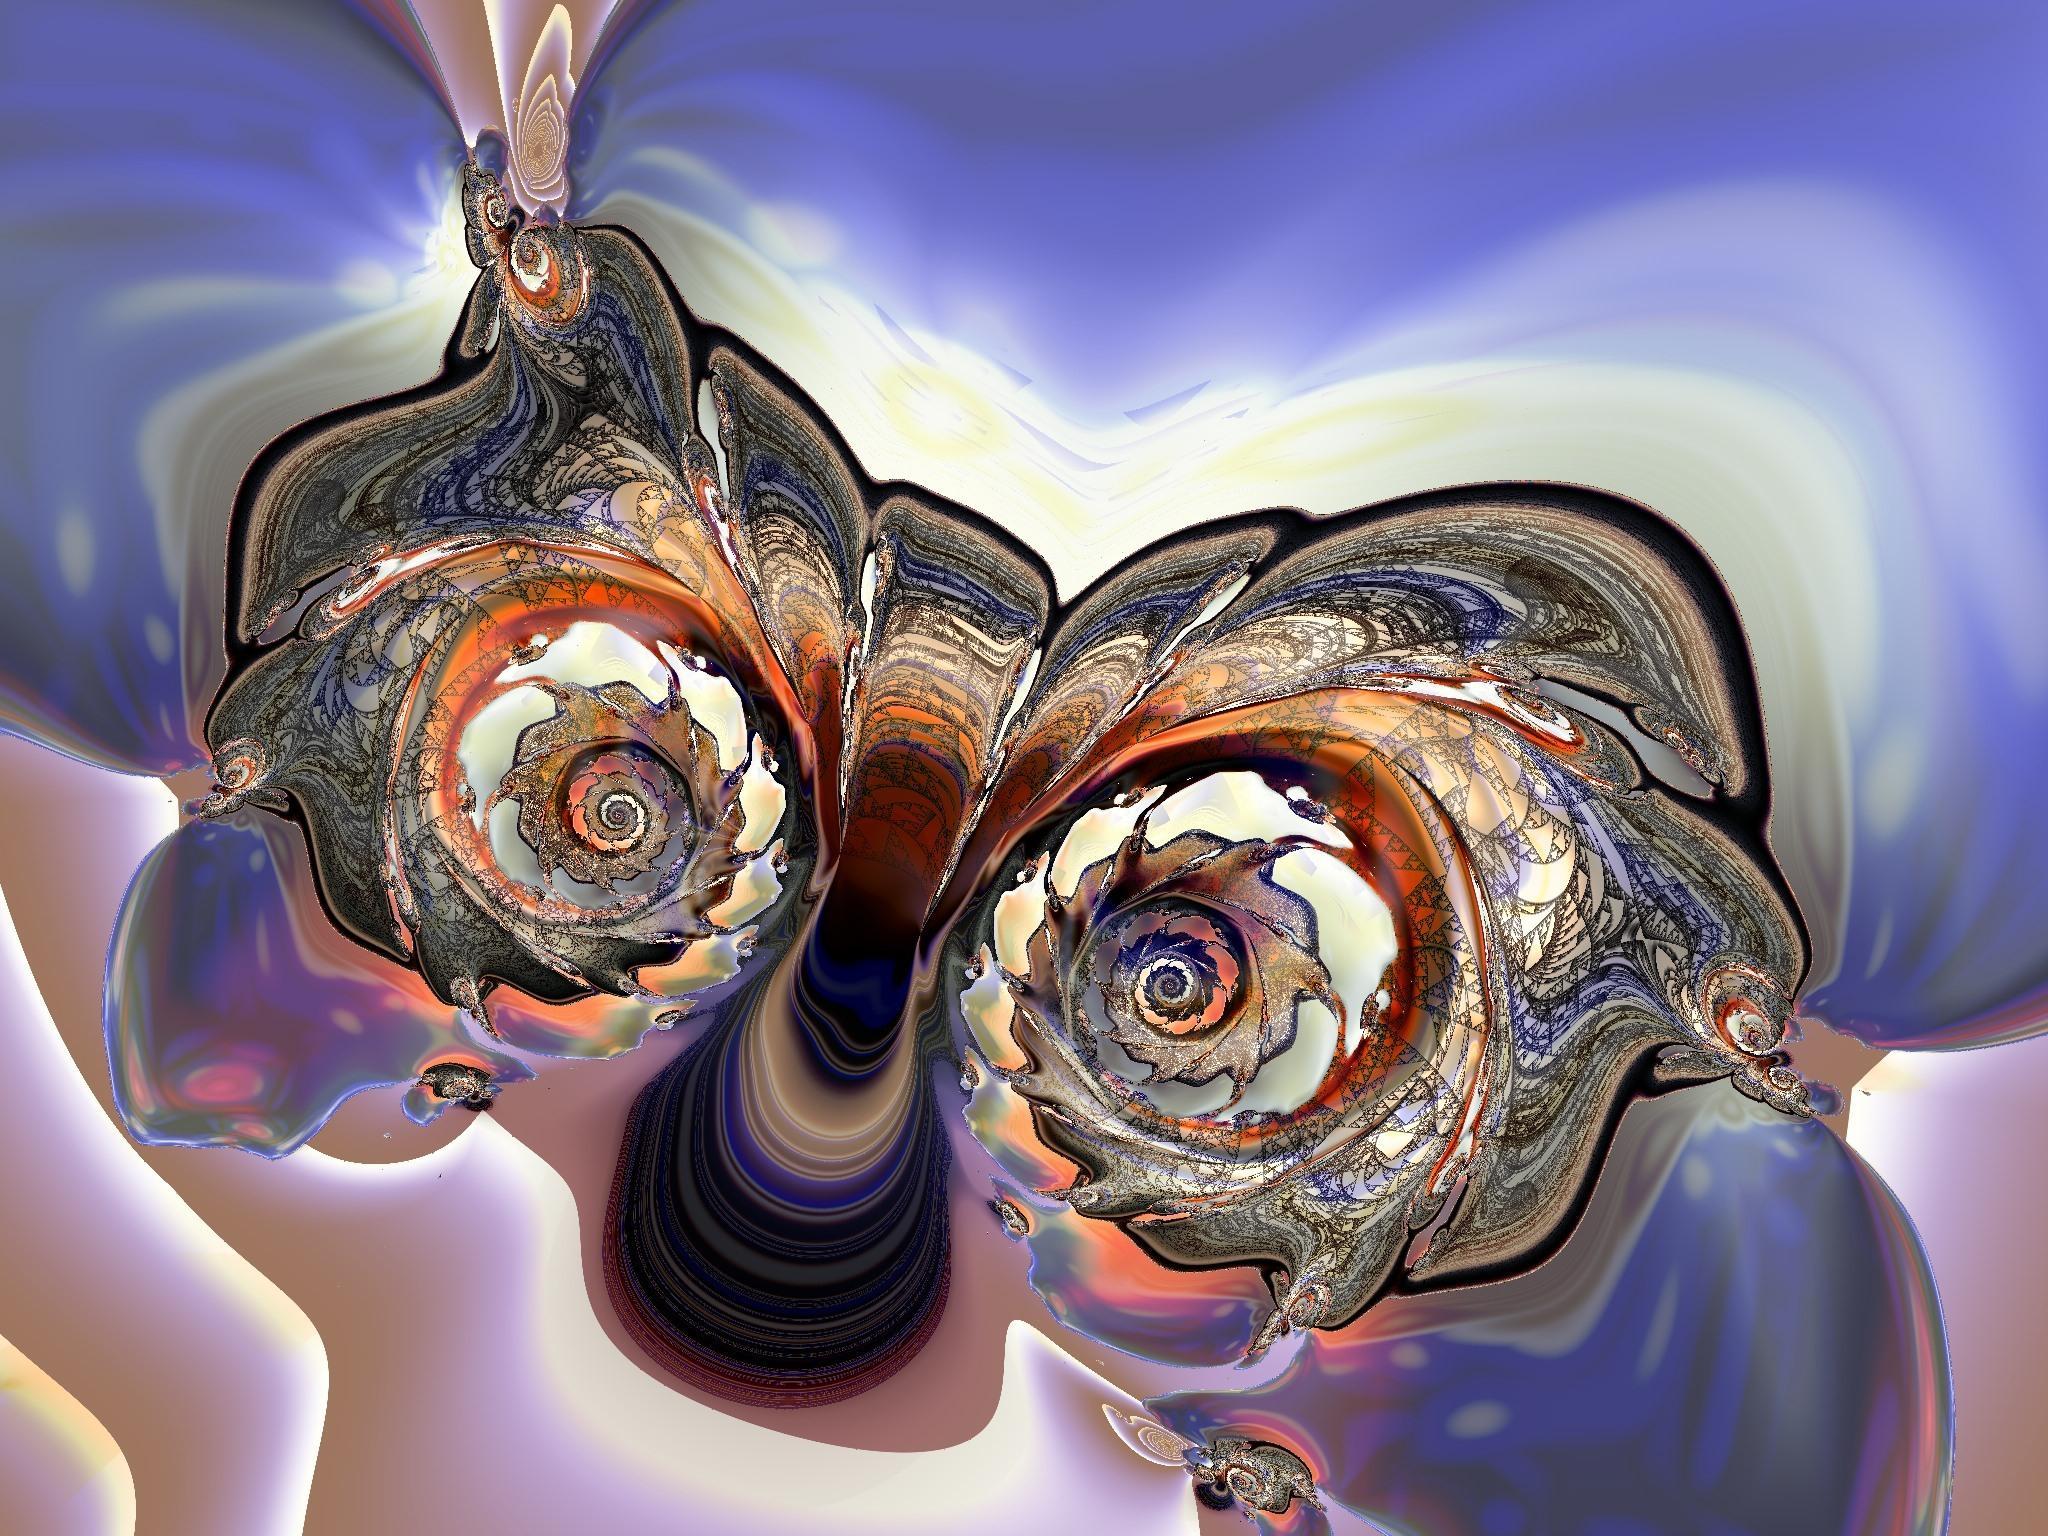 Fractal Image Silvano6